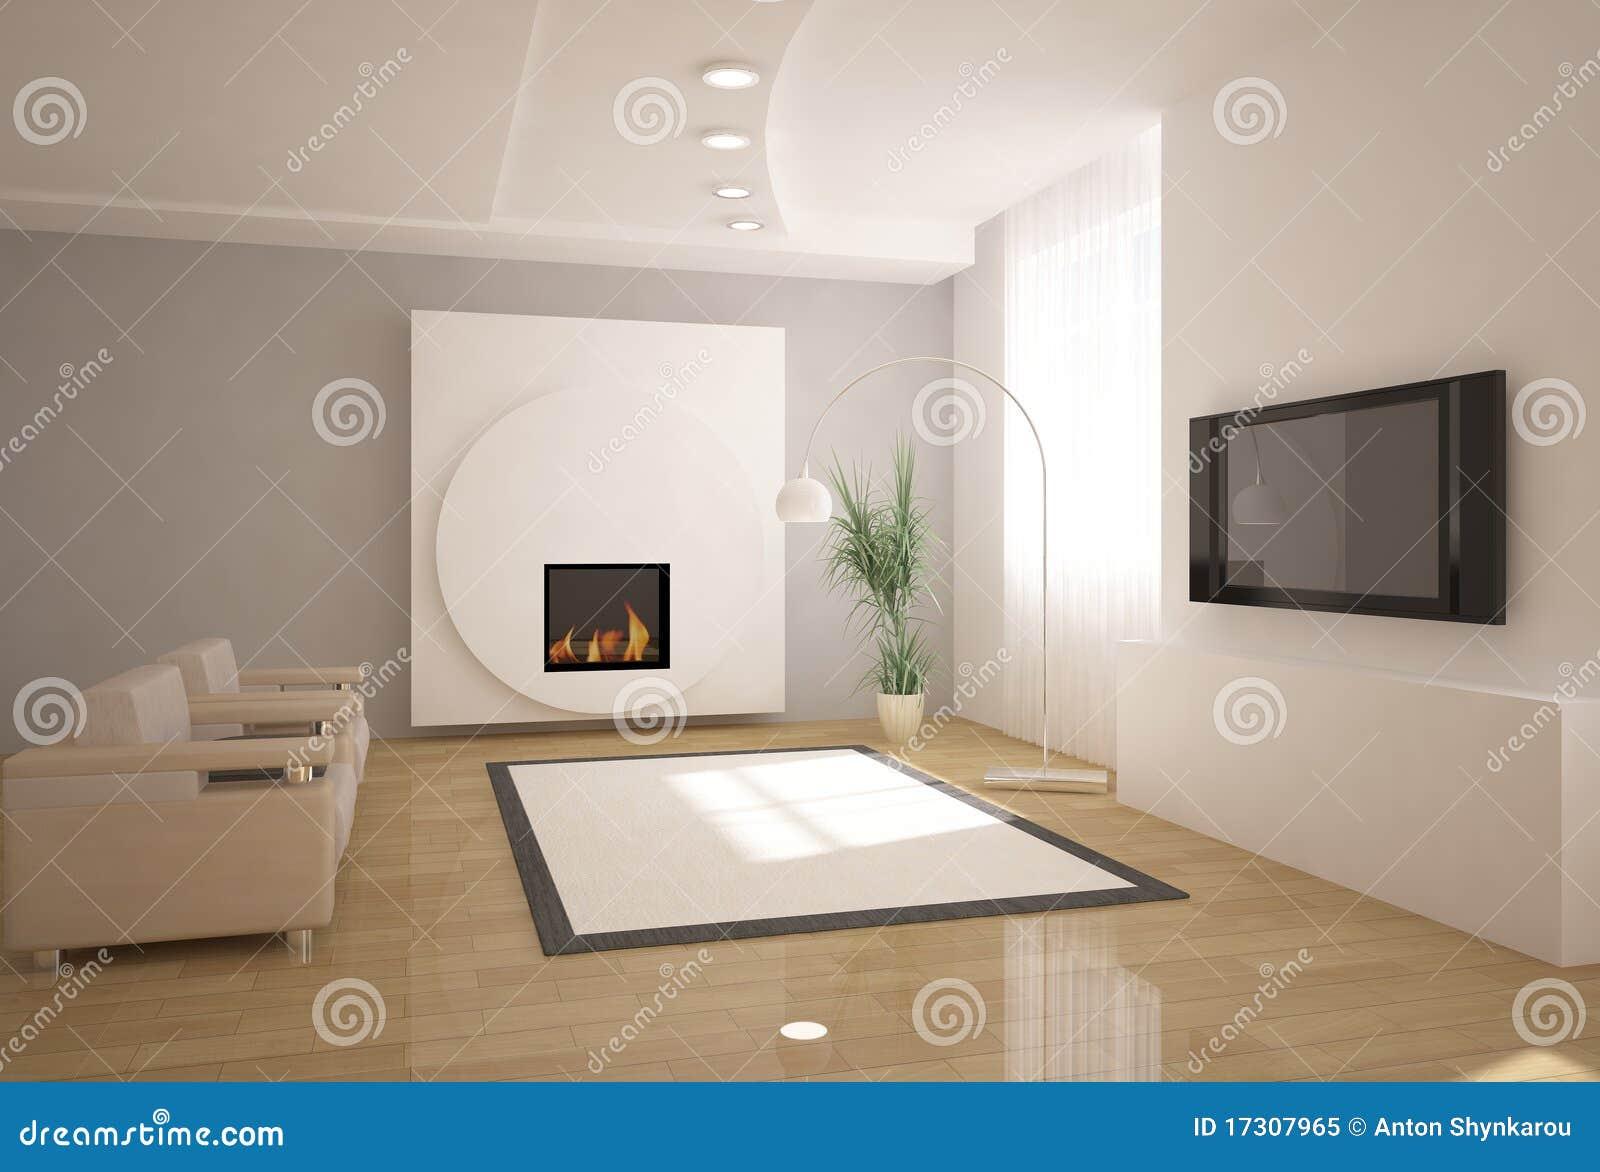 3d interior design royalty free stock photo image 17307965 for 3d interior design online free